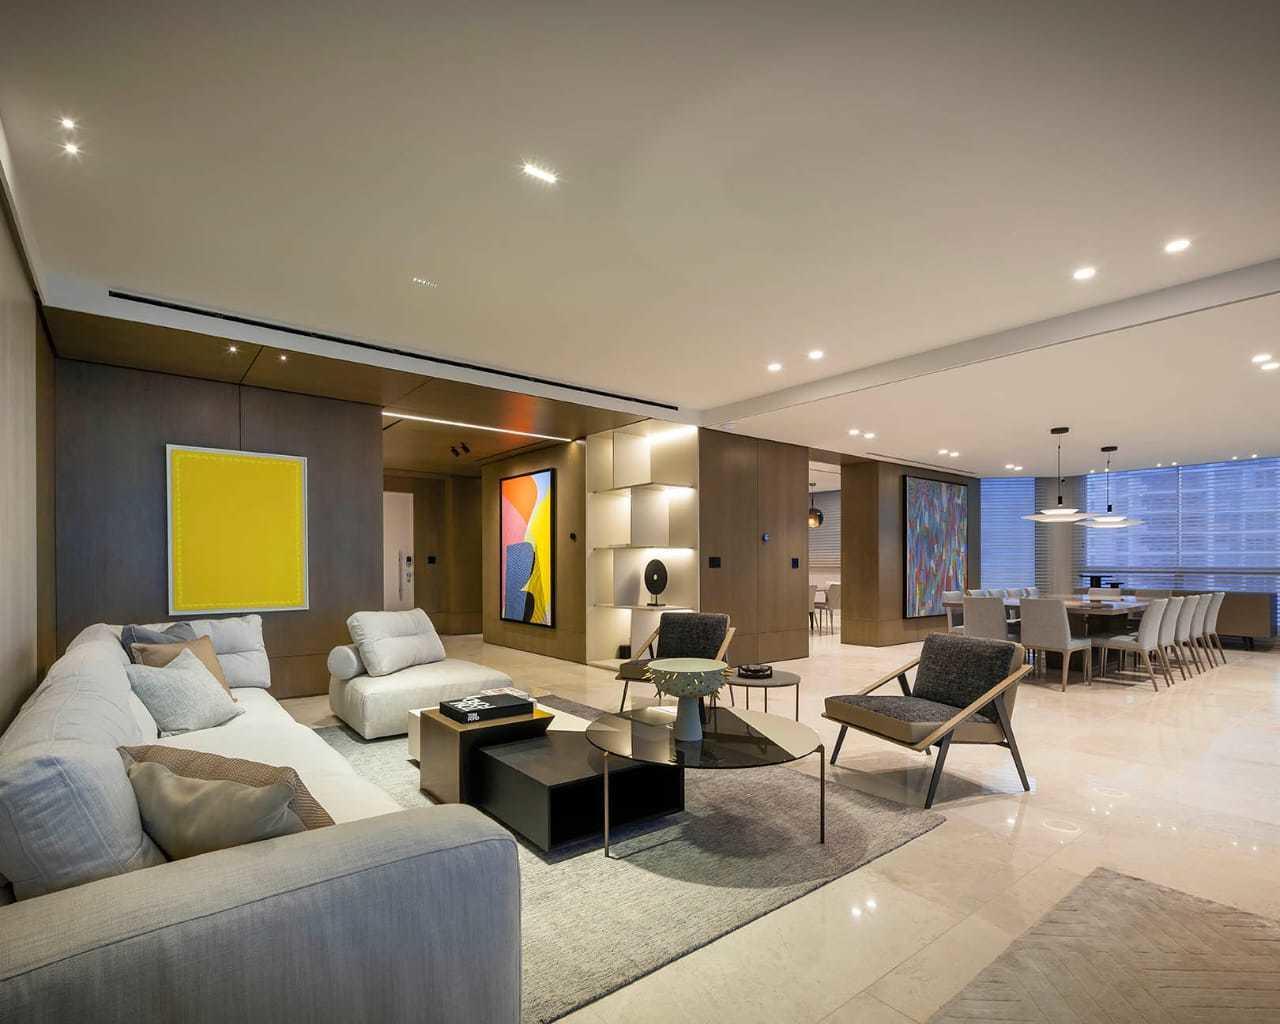 Apartamento Panama>Panama>Punta Pacifica - Venta:849.360 US Dollar - codigo: 21-8671